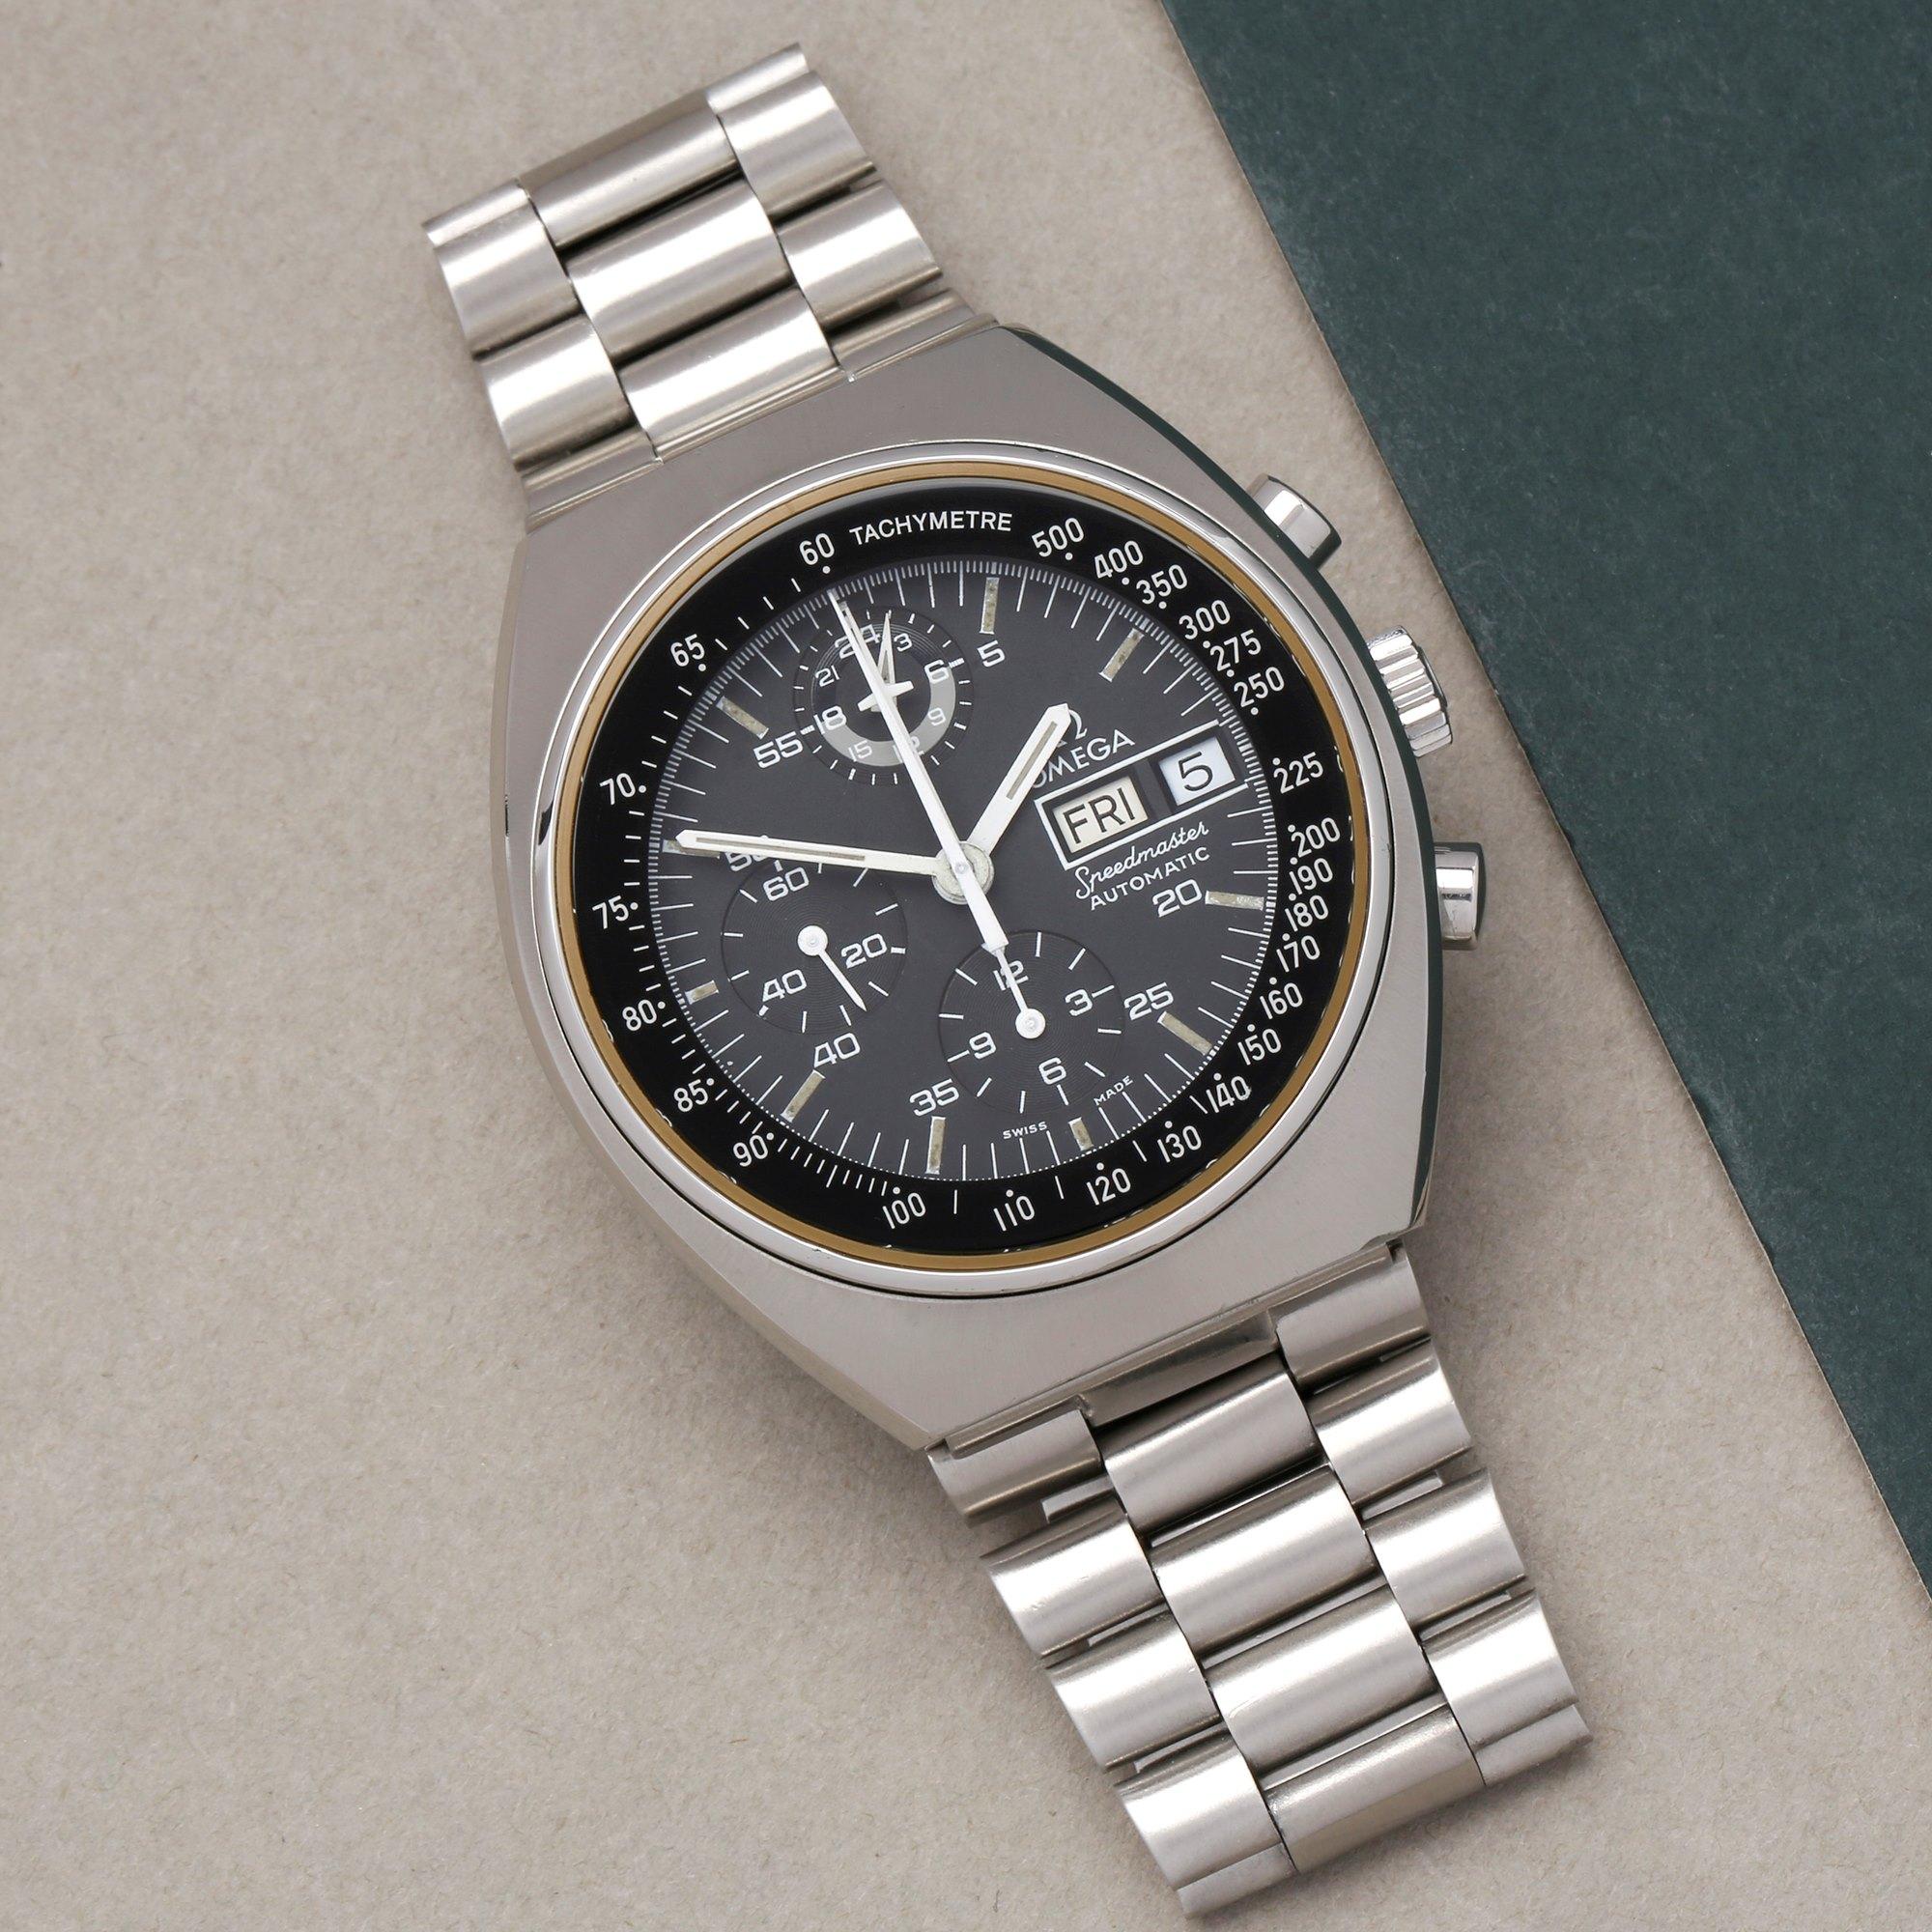 Omega Speedmaster Mark 4.5 Chronograph Stainless Steel - 176.0012 Roestvrij Staal 176.0012